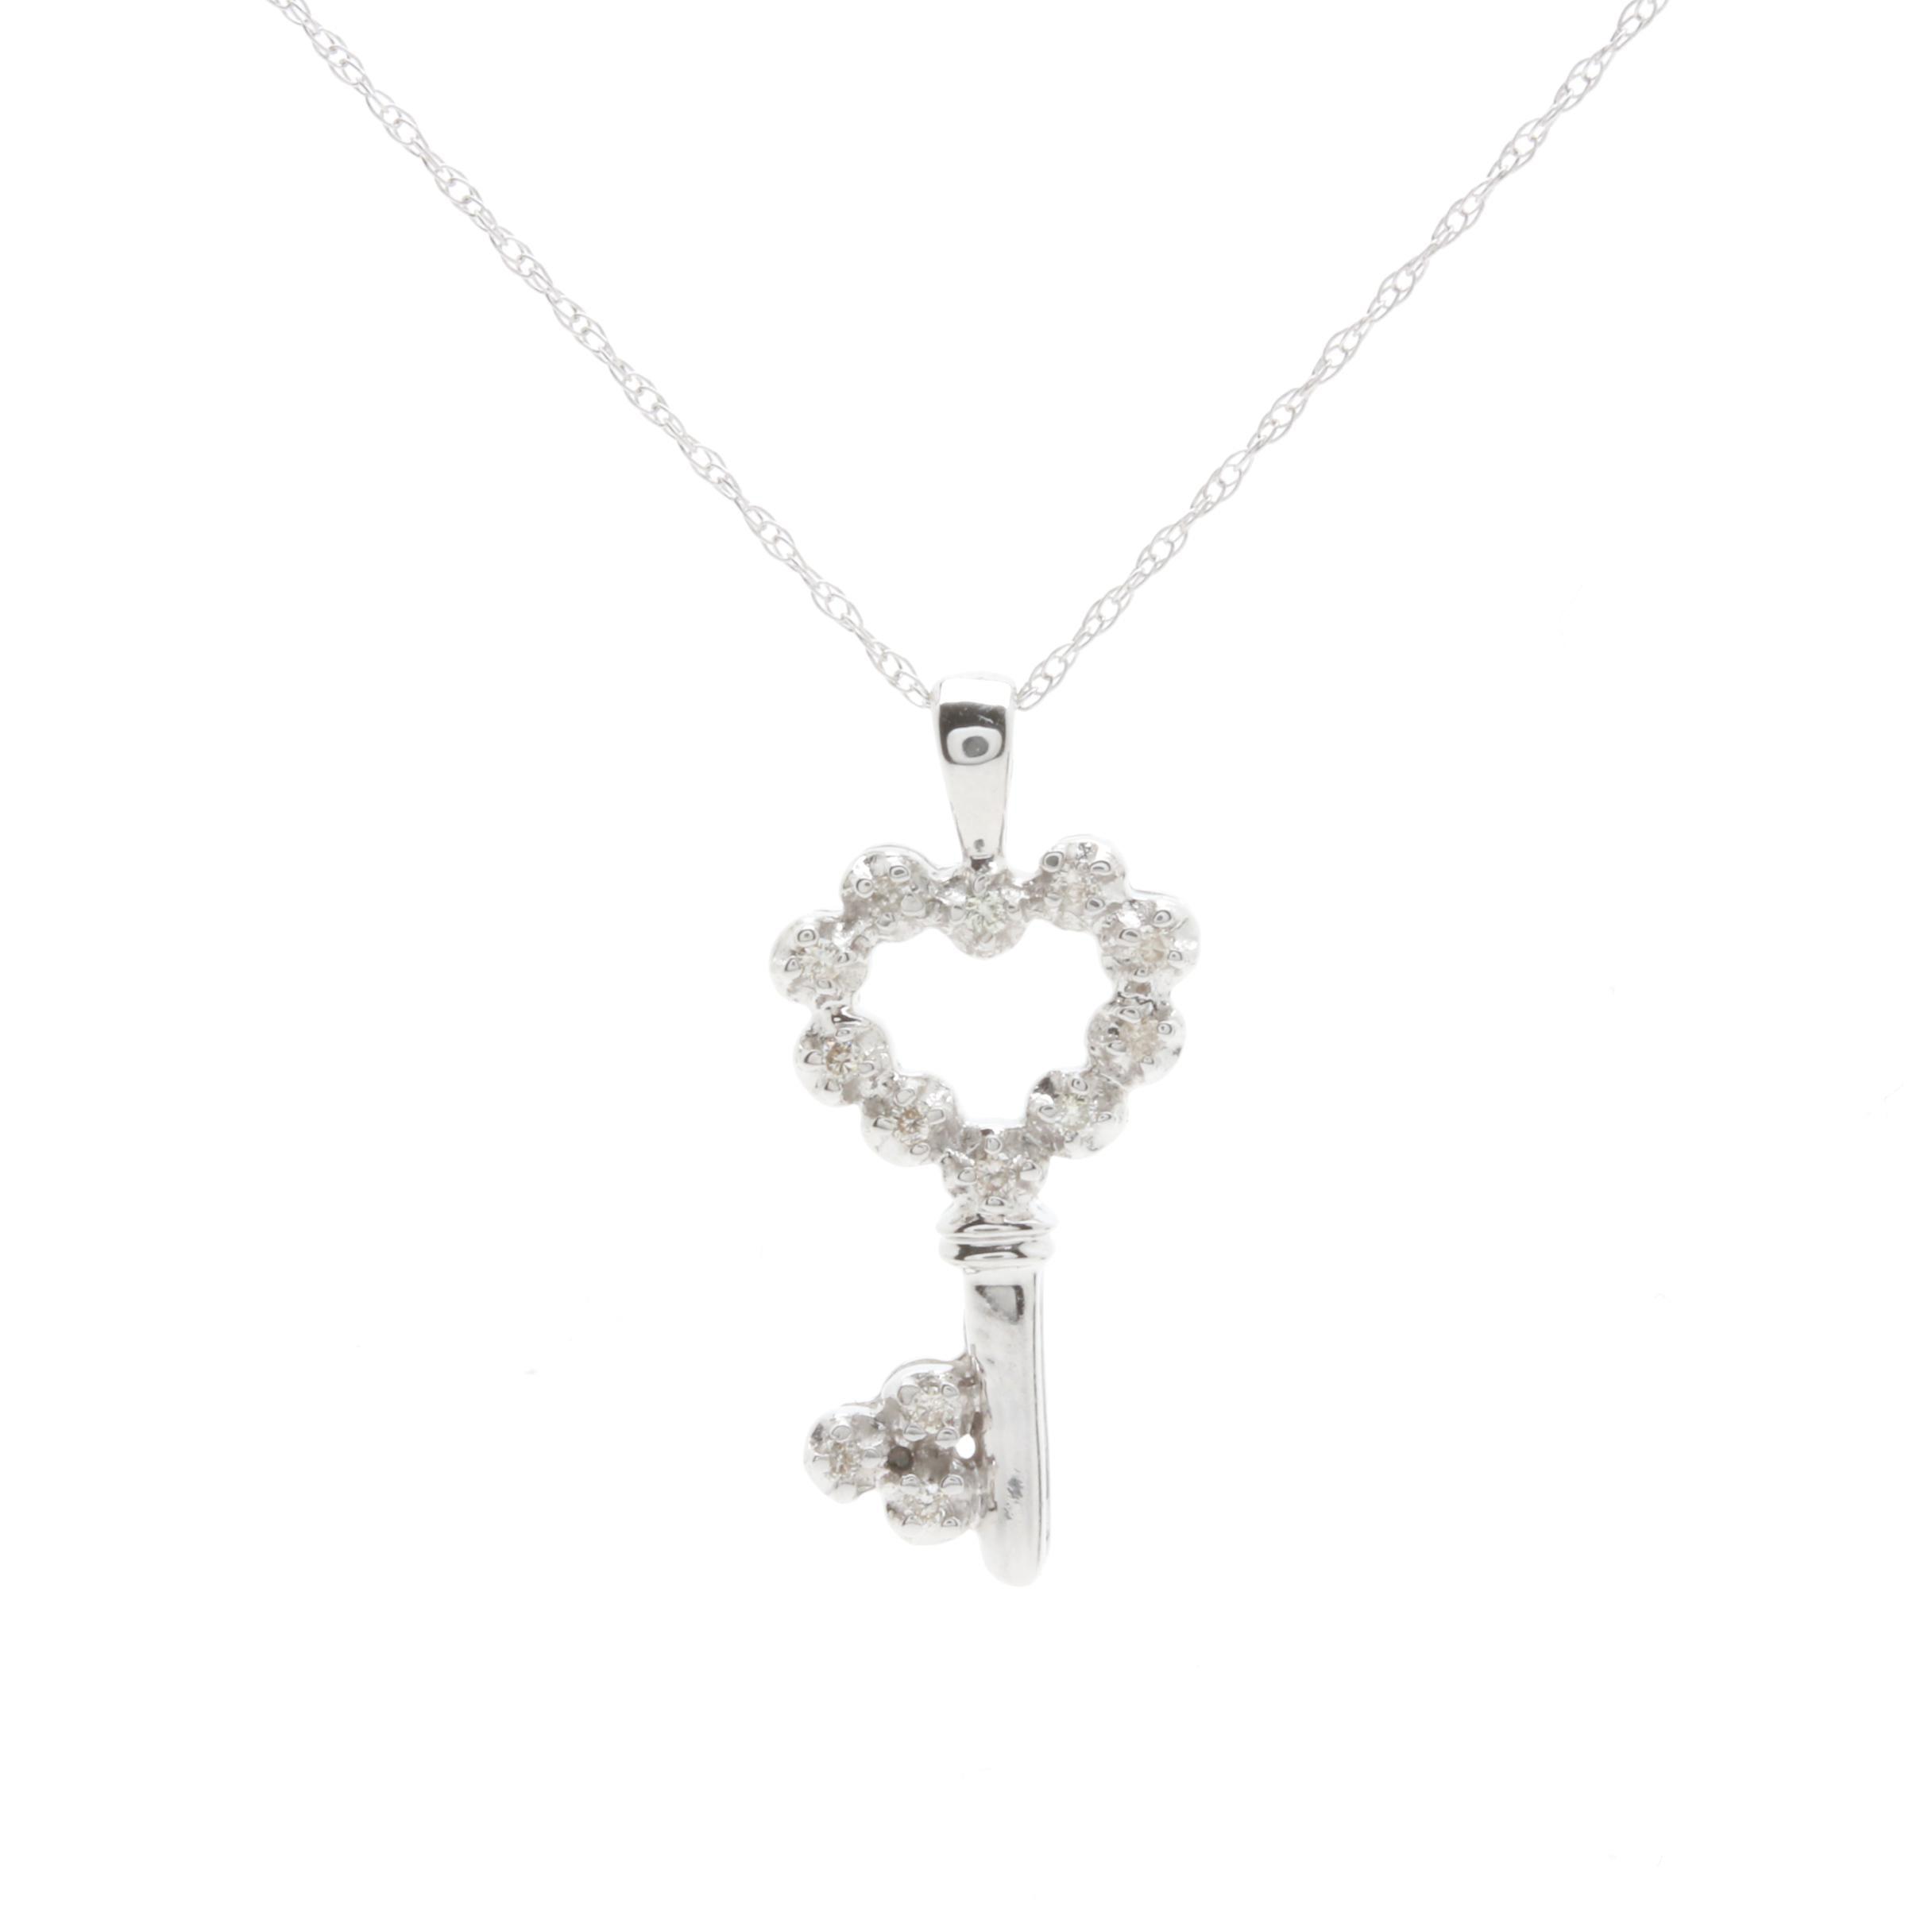 14K White Gold Diamond Key Pendant Necklace